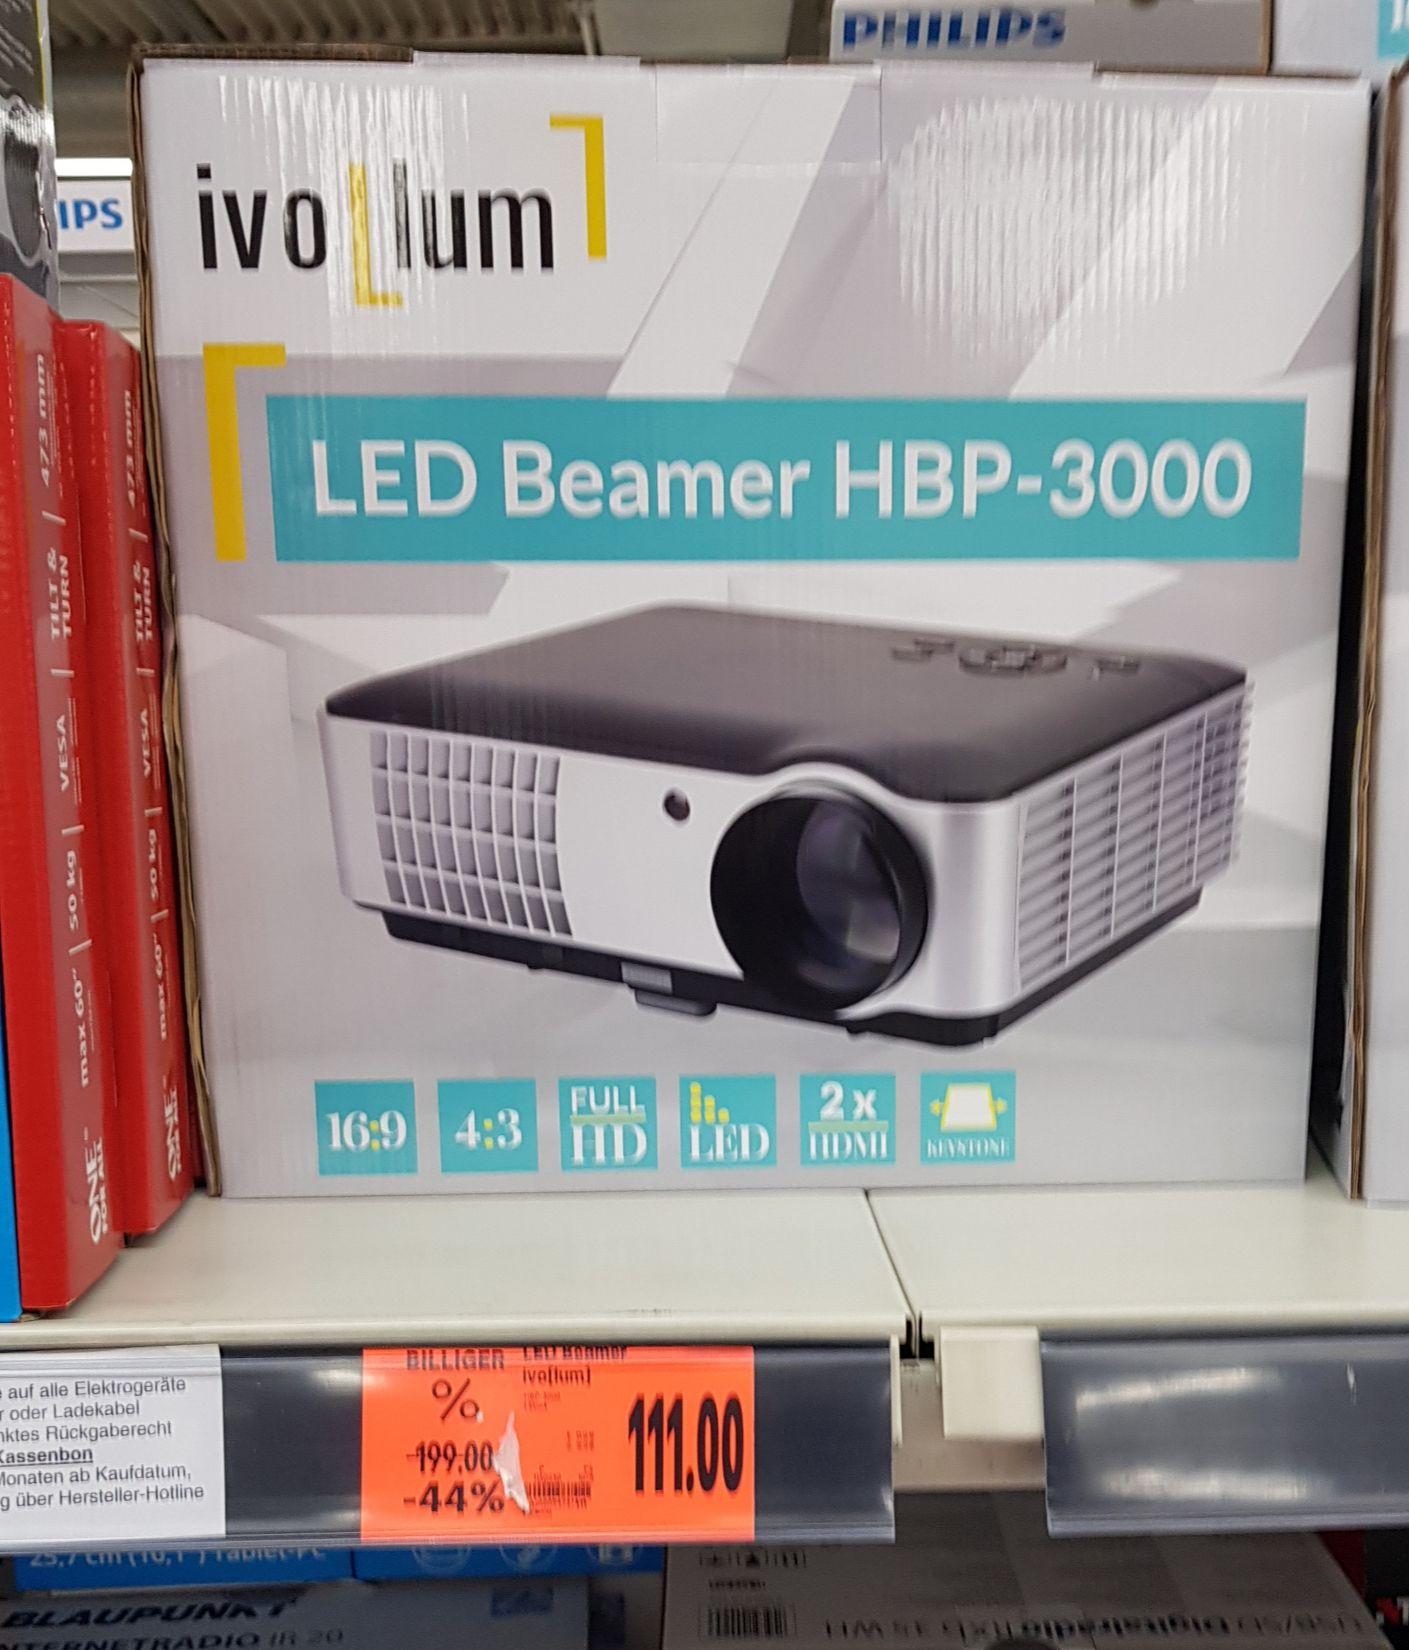 [Offline]  ivolum LED Beamer HBP 3000 -  2800 Lumen @ Kaufland